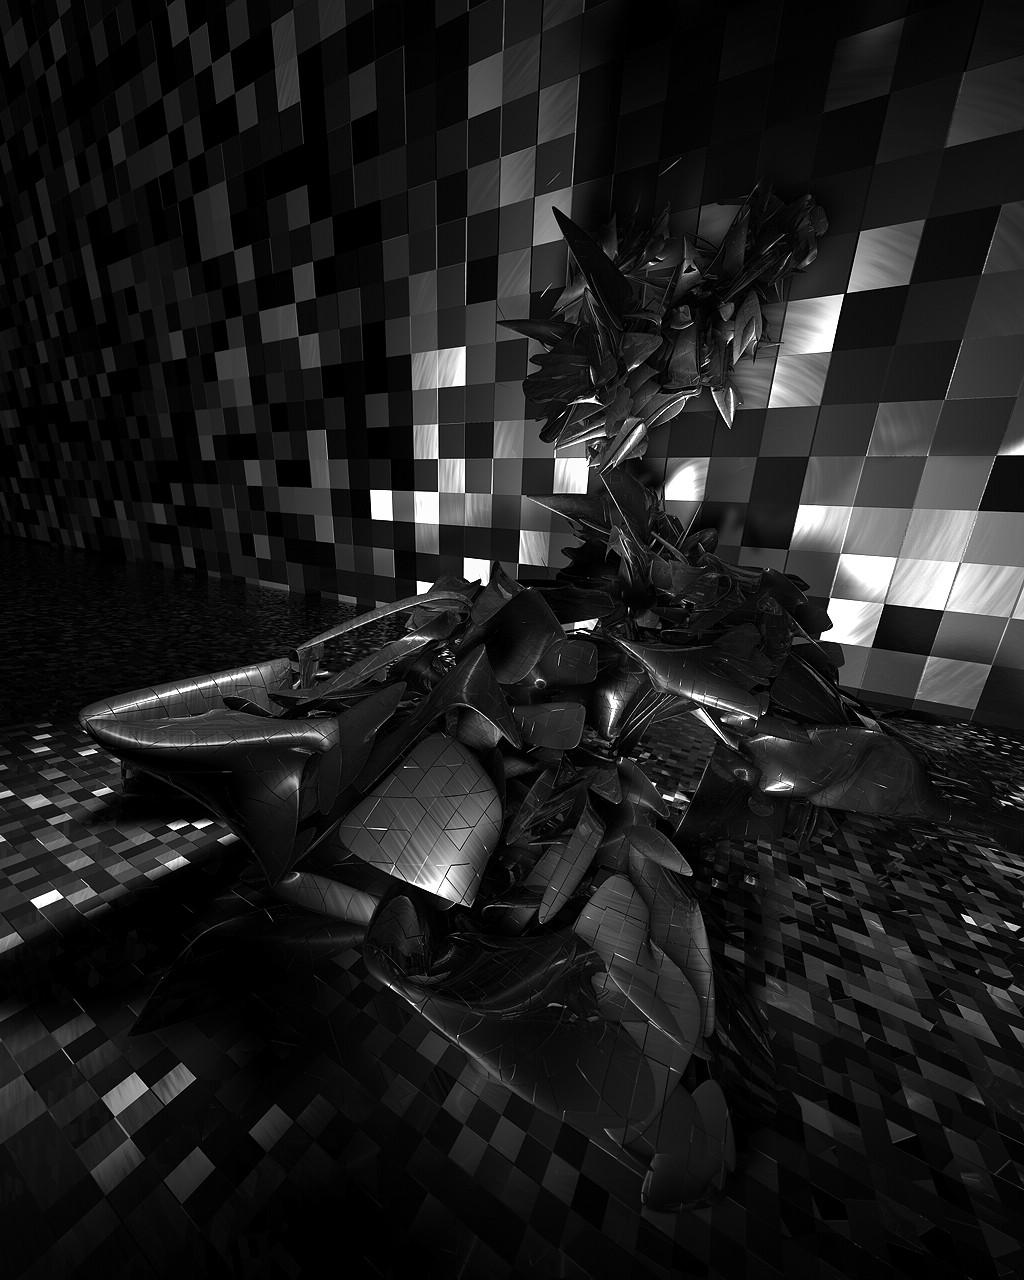 white black digital art monochrome night abstract photography symmetry light lighting shape design darkness screenshot computer